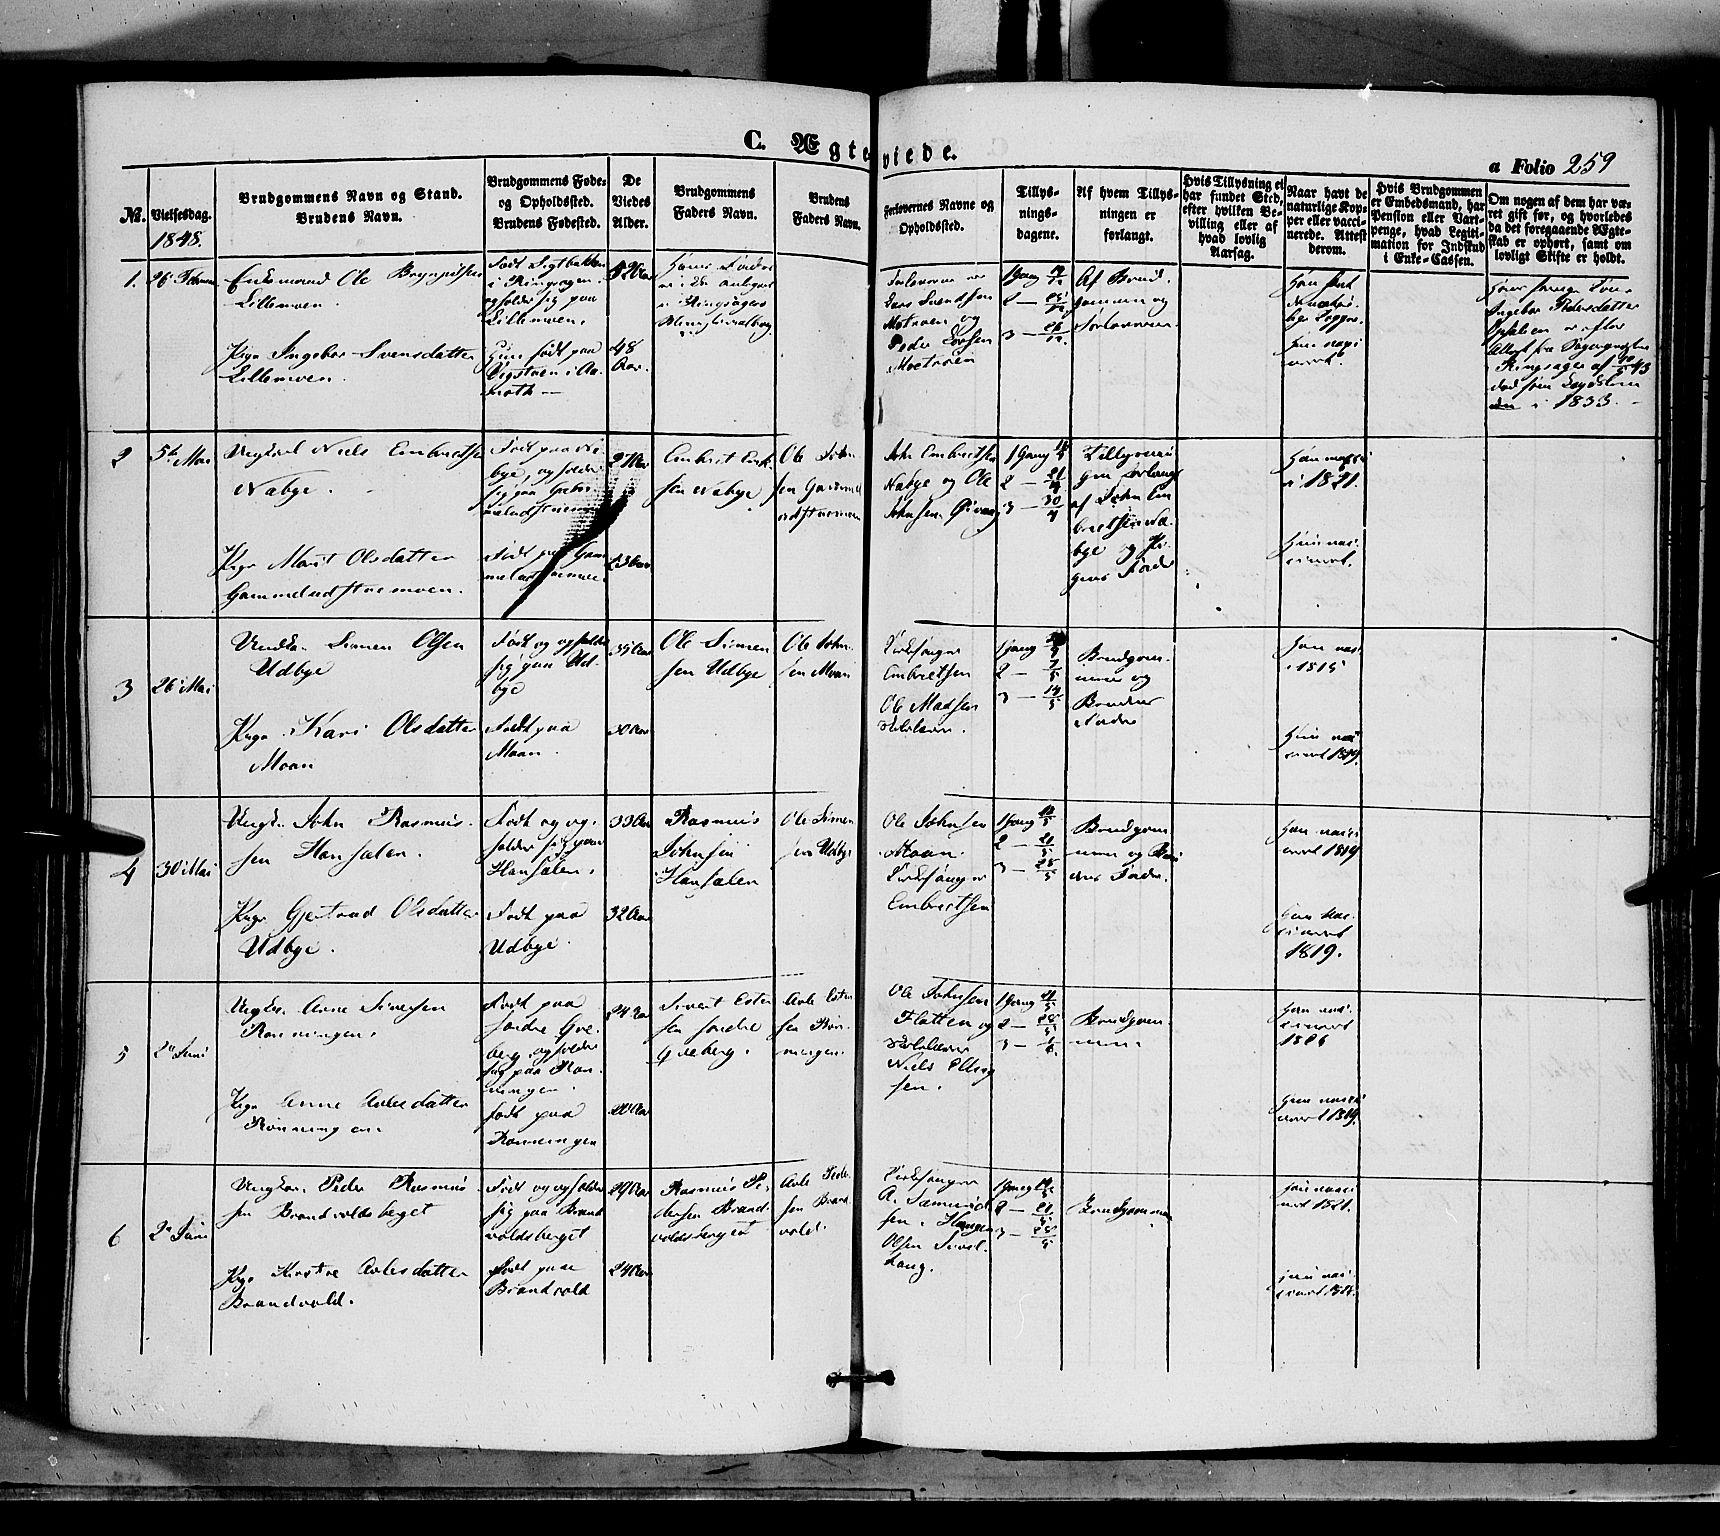 SAH, Tynset prestekontor, Ministerialbok nr. 20, 1848-1862, s. 259